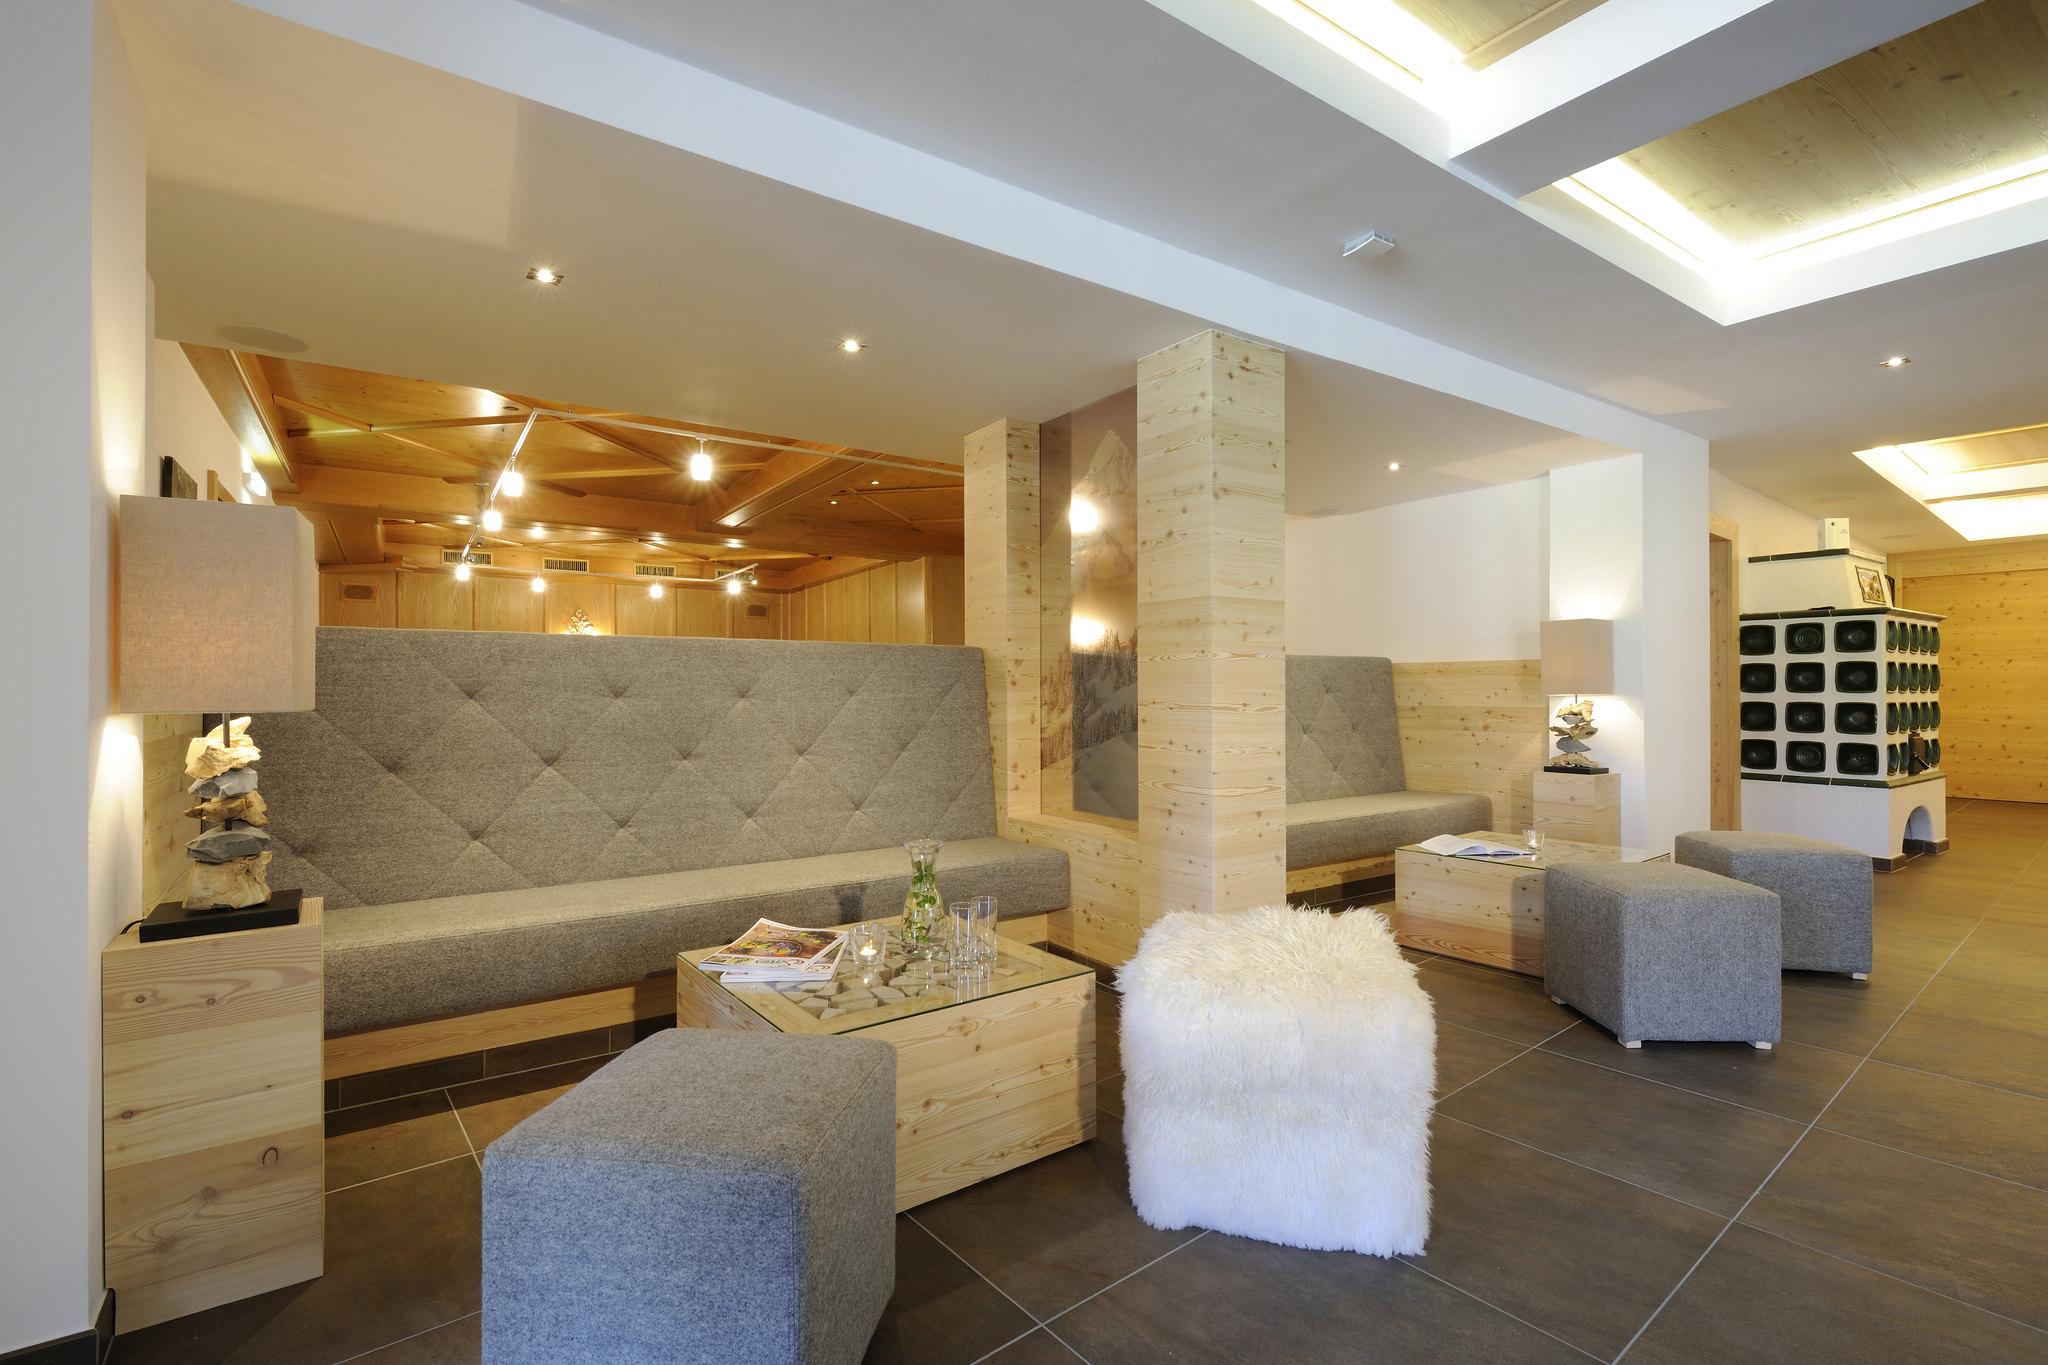 Lobby Hotel Marten Saalbach-Hinterglemm